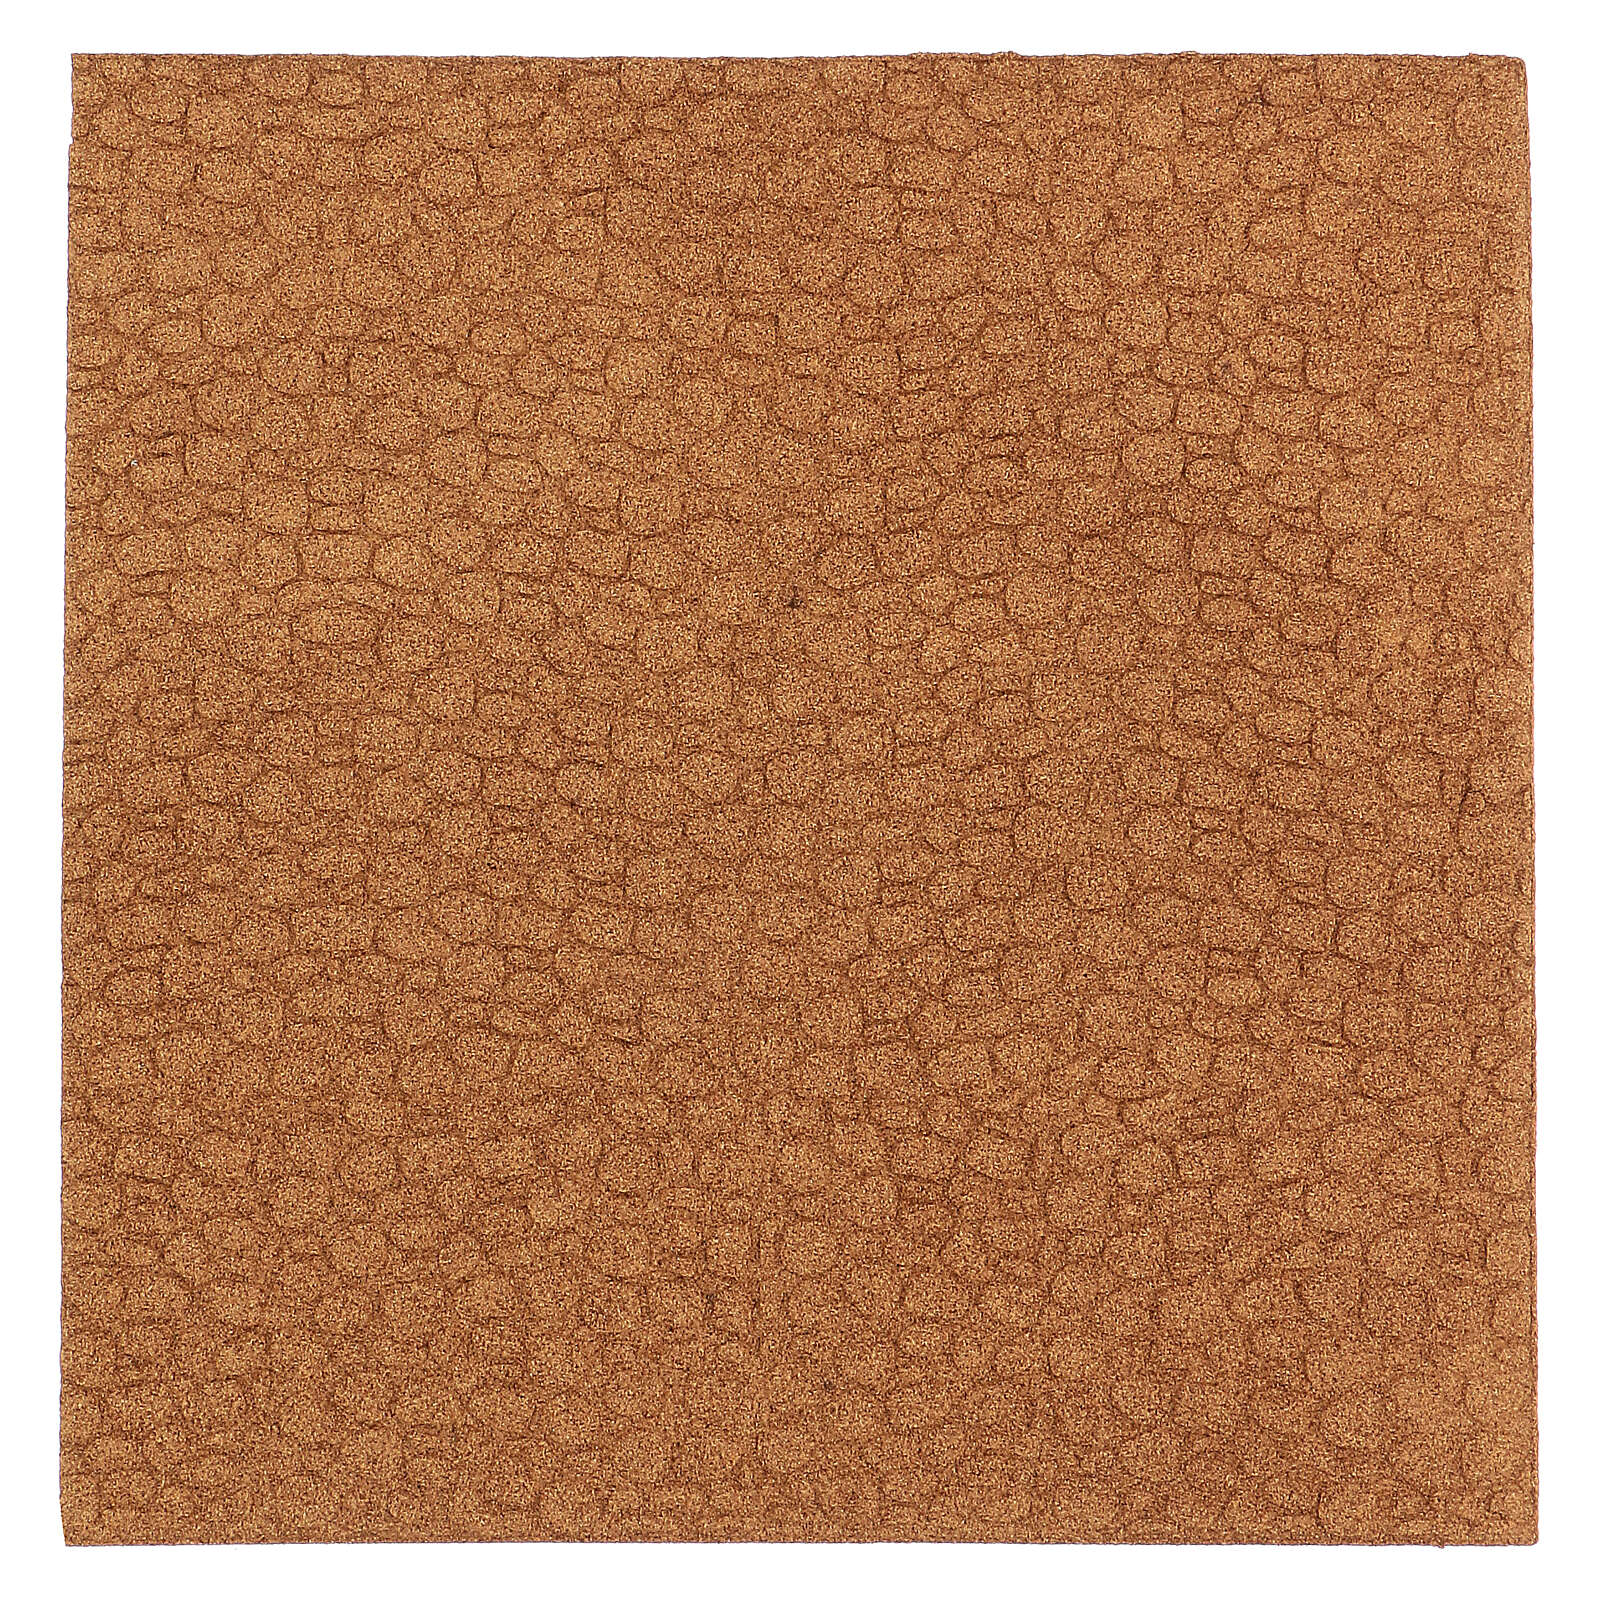 Plancha corcho muro piedra irregular 100x50x1 4